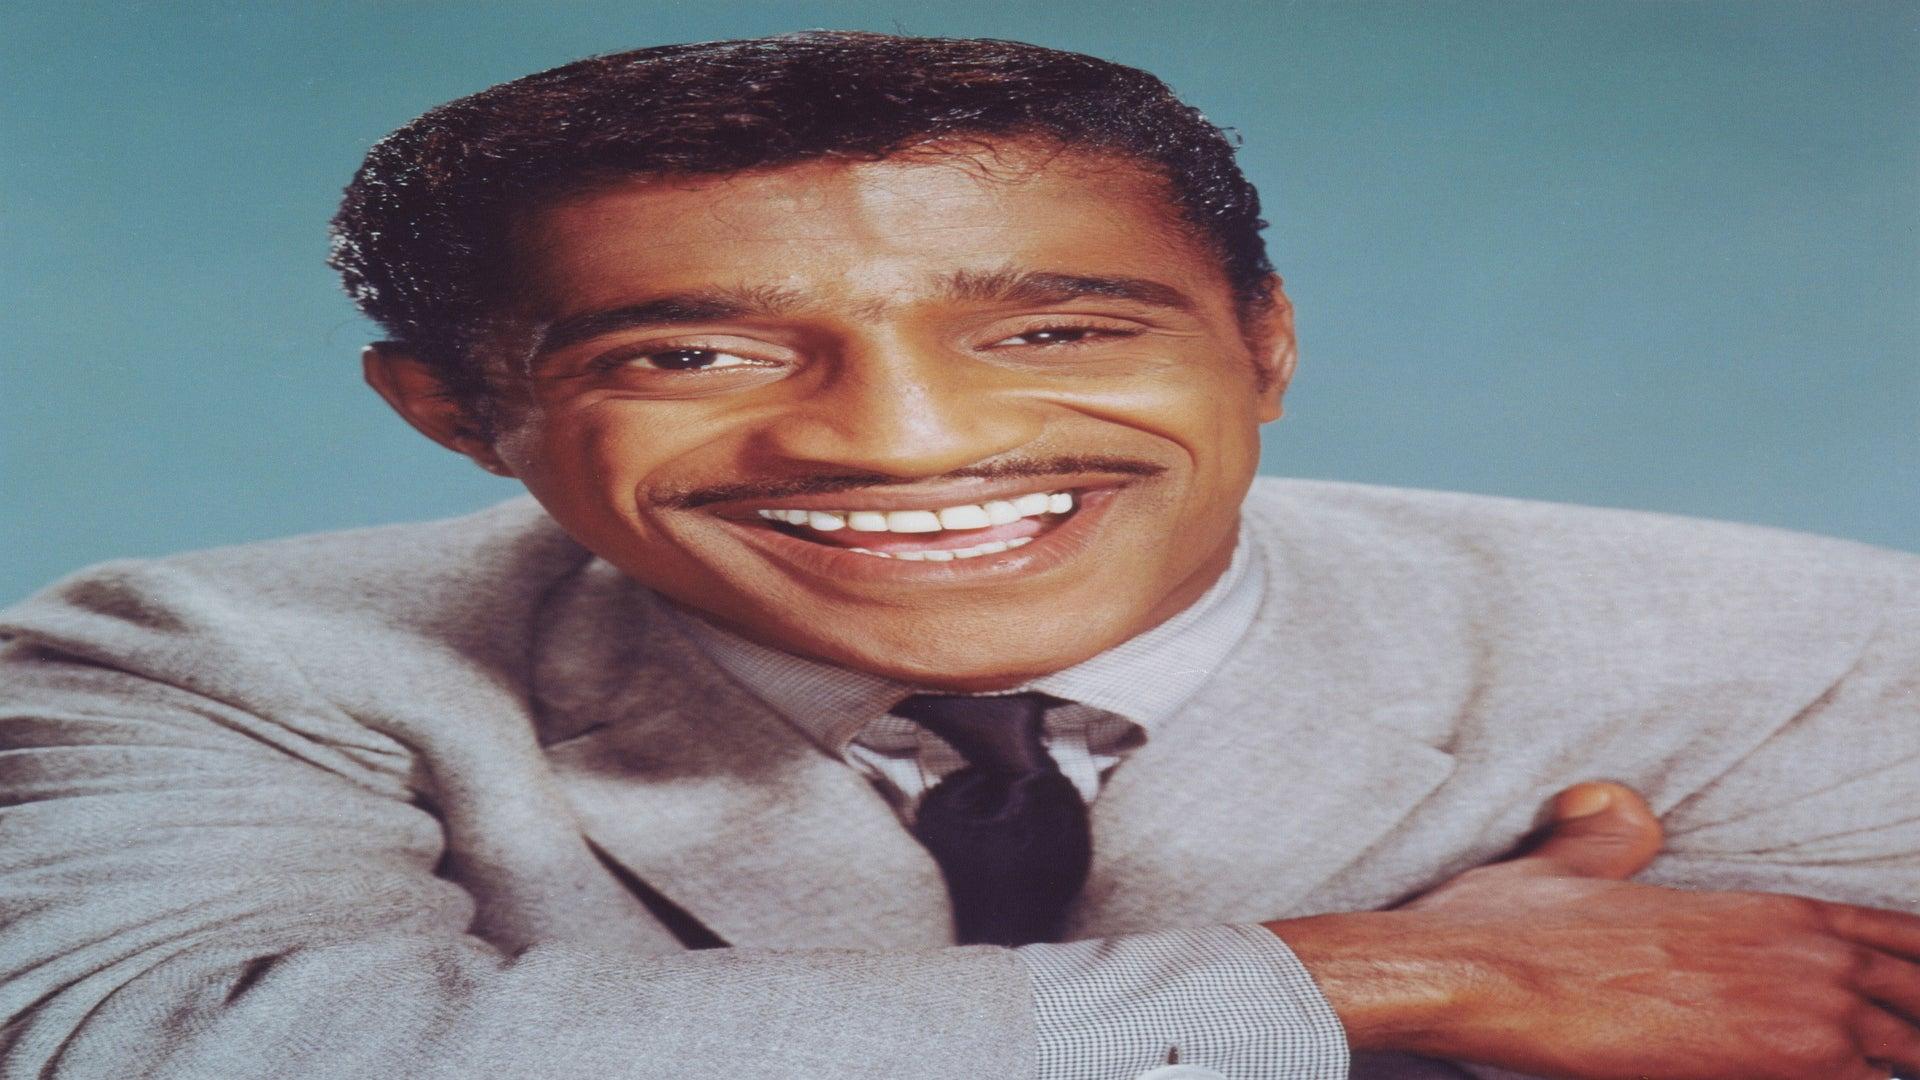 Lionel Richie Set To Produce Long-Awaited Sammy Davis Jr. Biopic